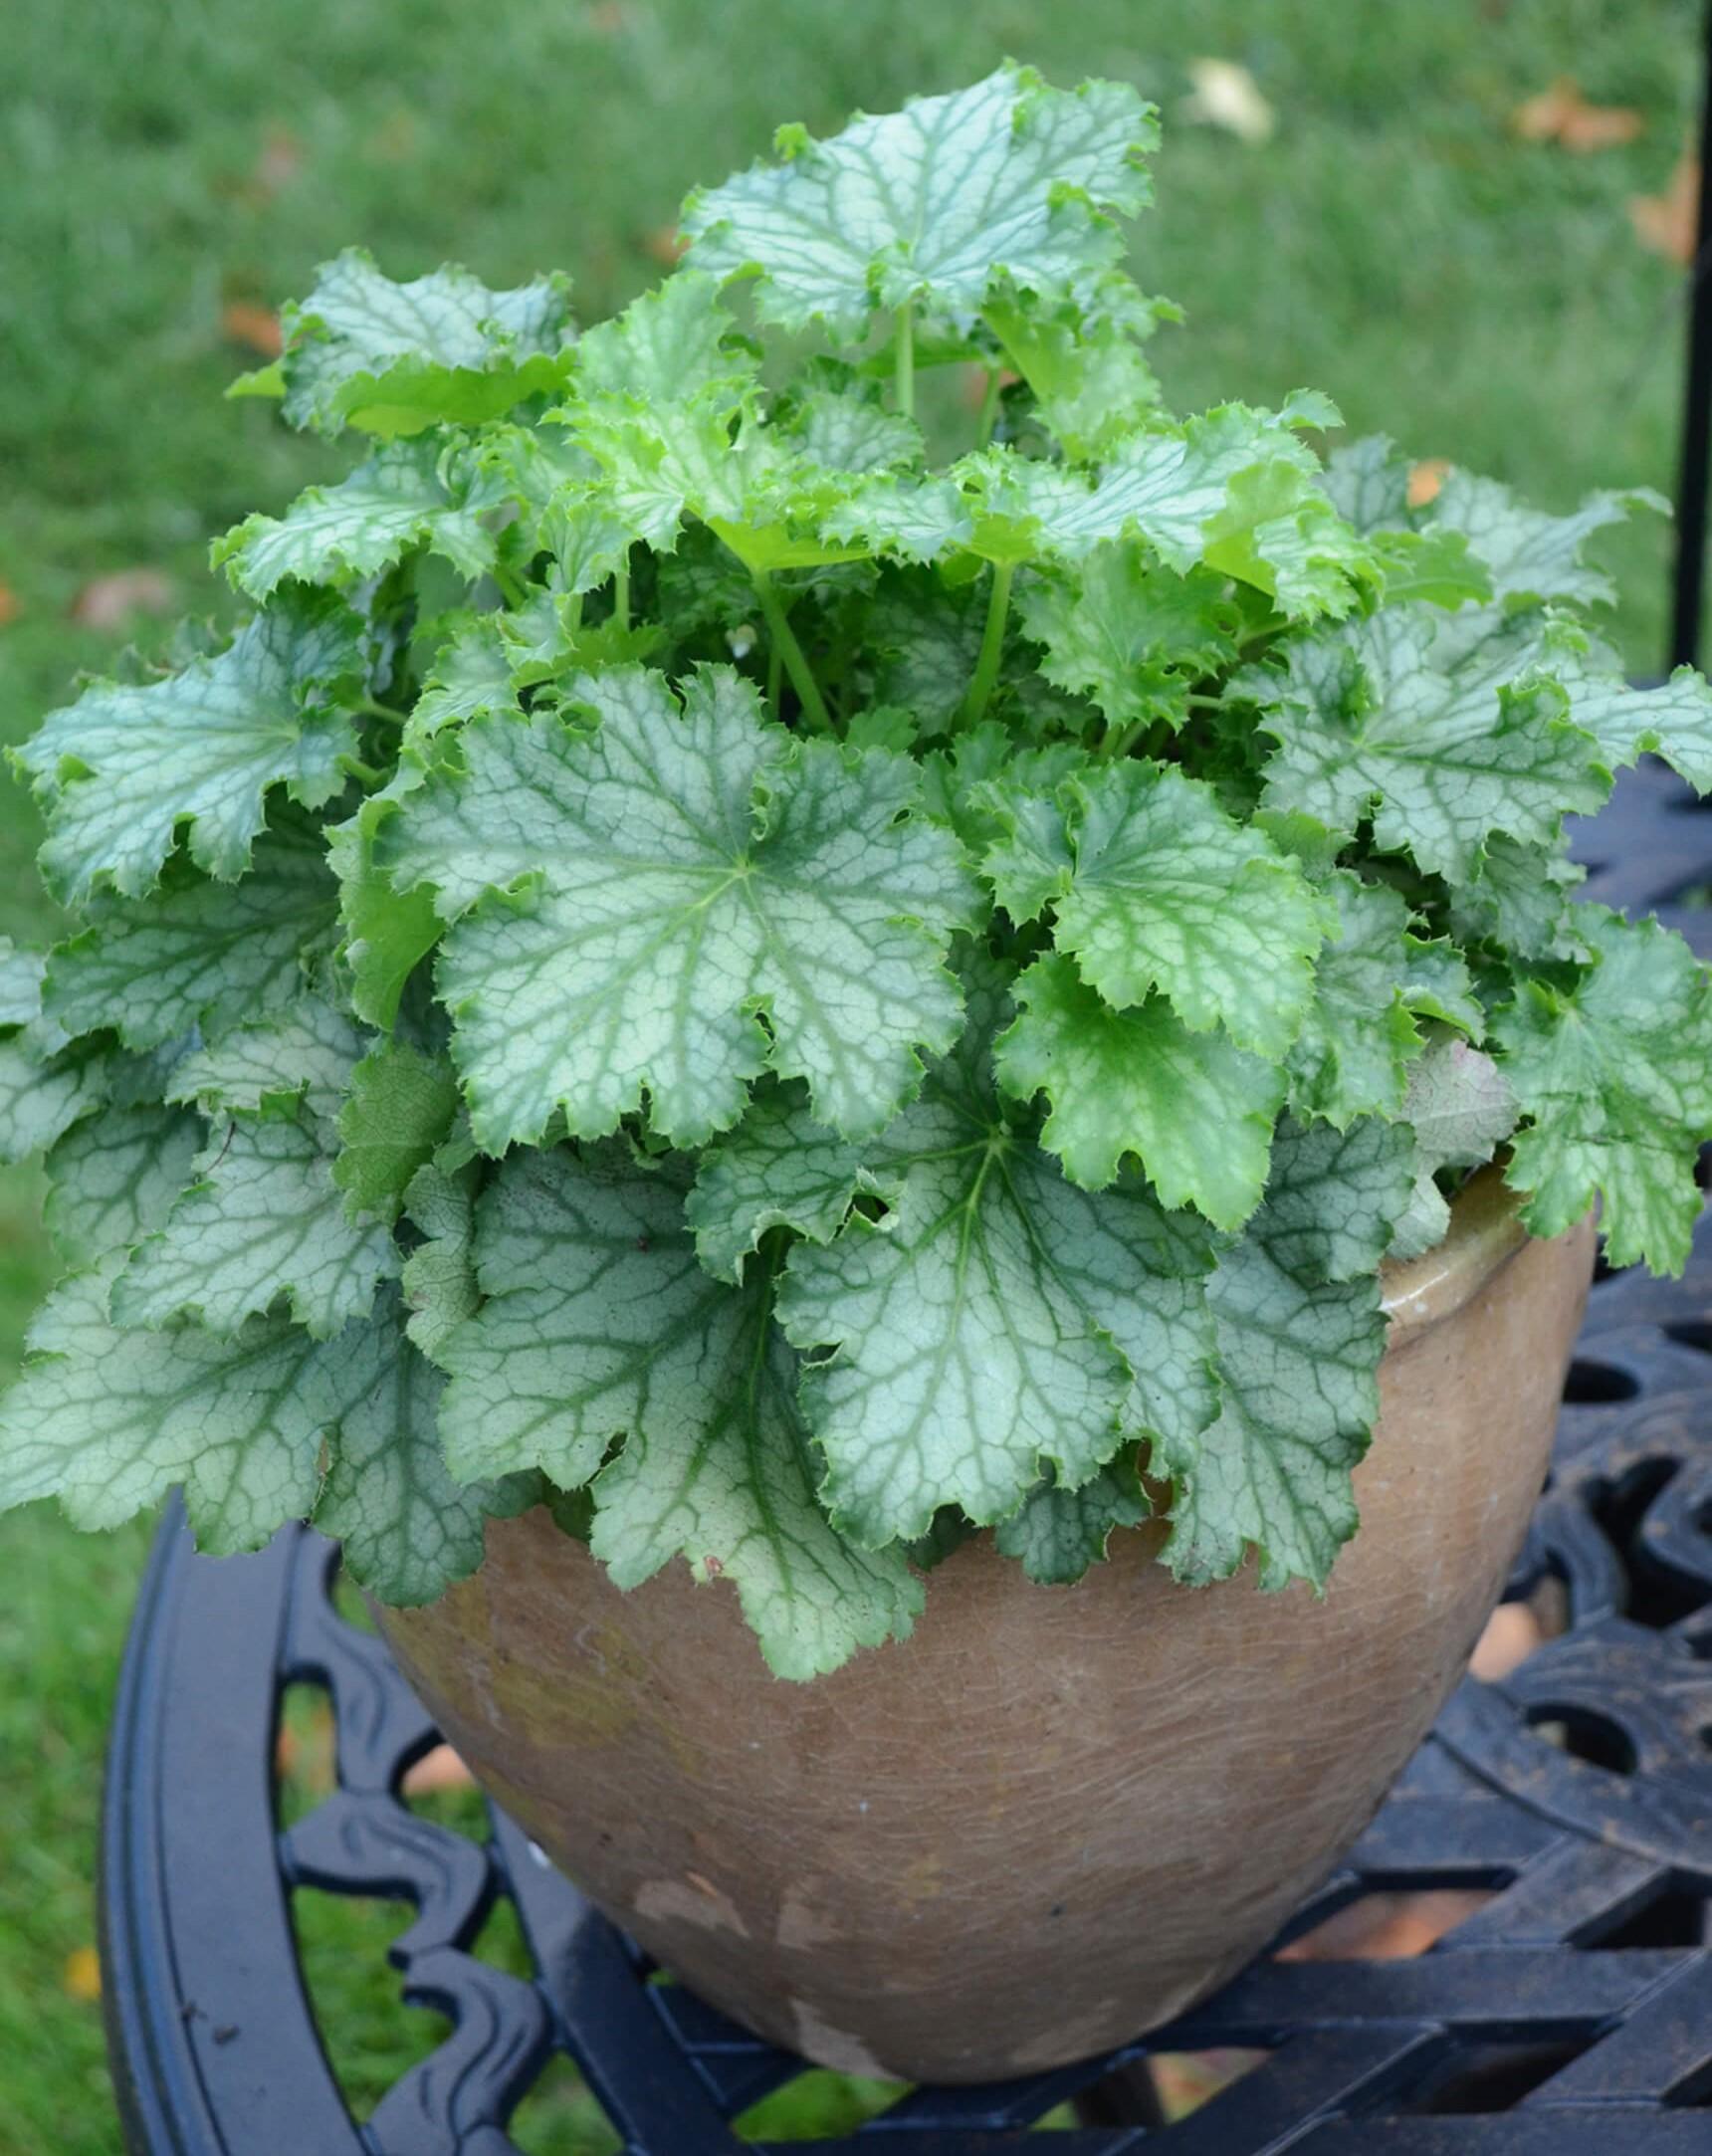 Purpurglöckchen (Heuchera) 'Lime Swizzle' T12, grün-silber - winterhart -